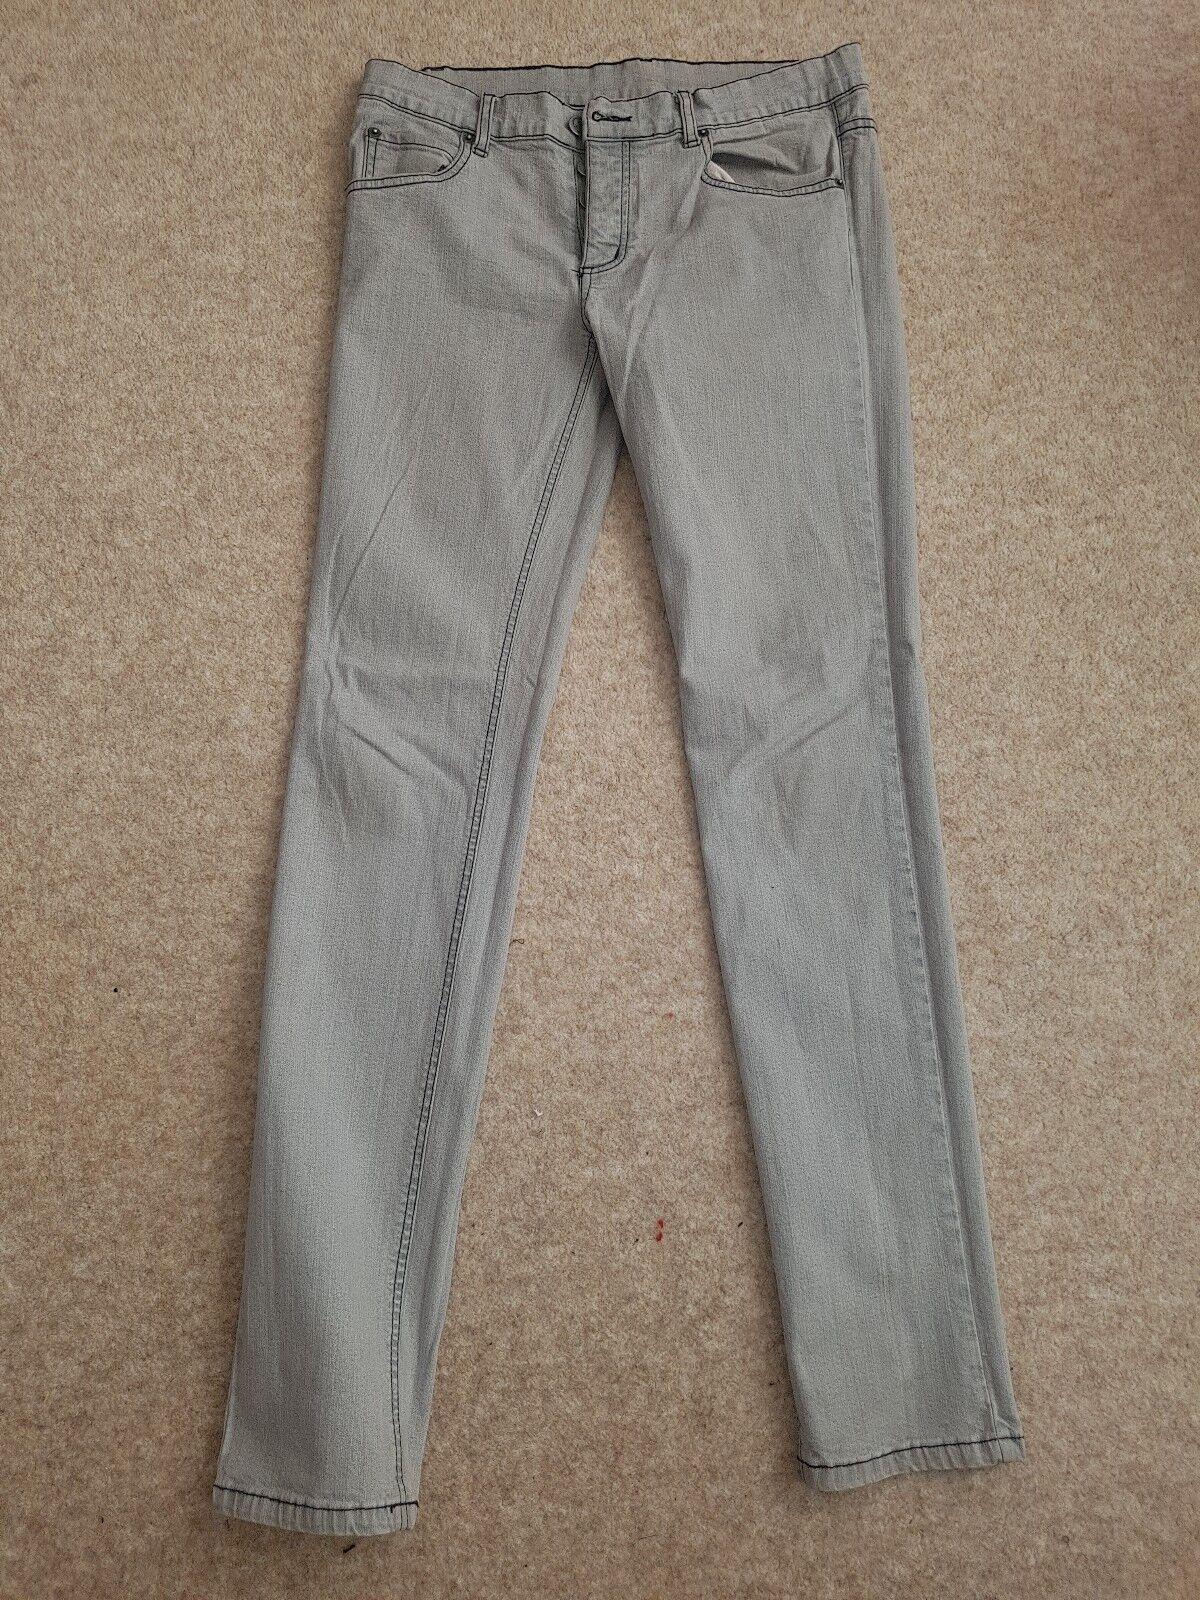 Cheap Monday grey skinny jeans size 31 x32